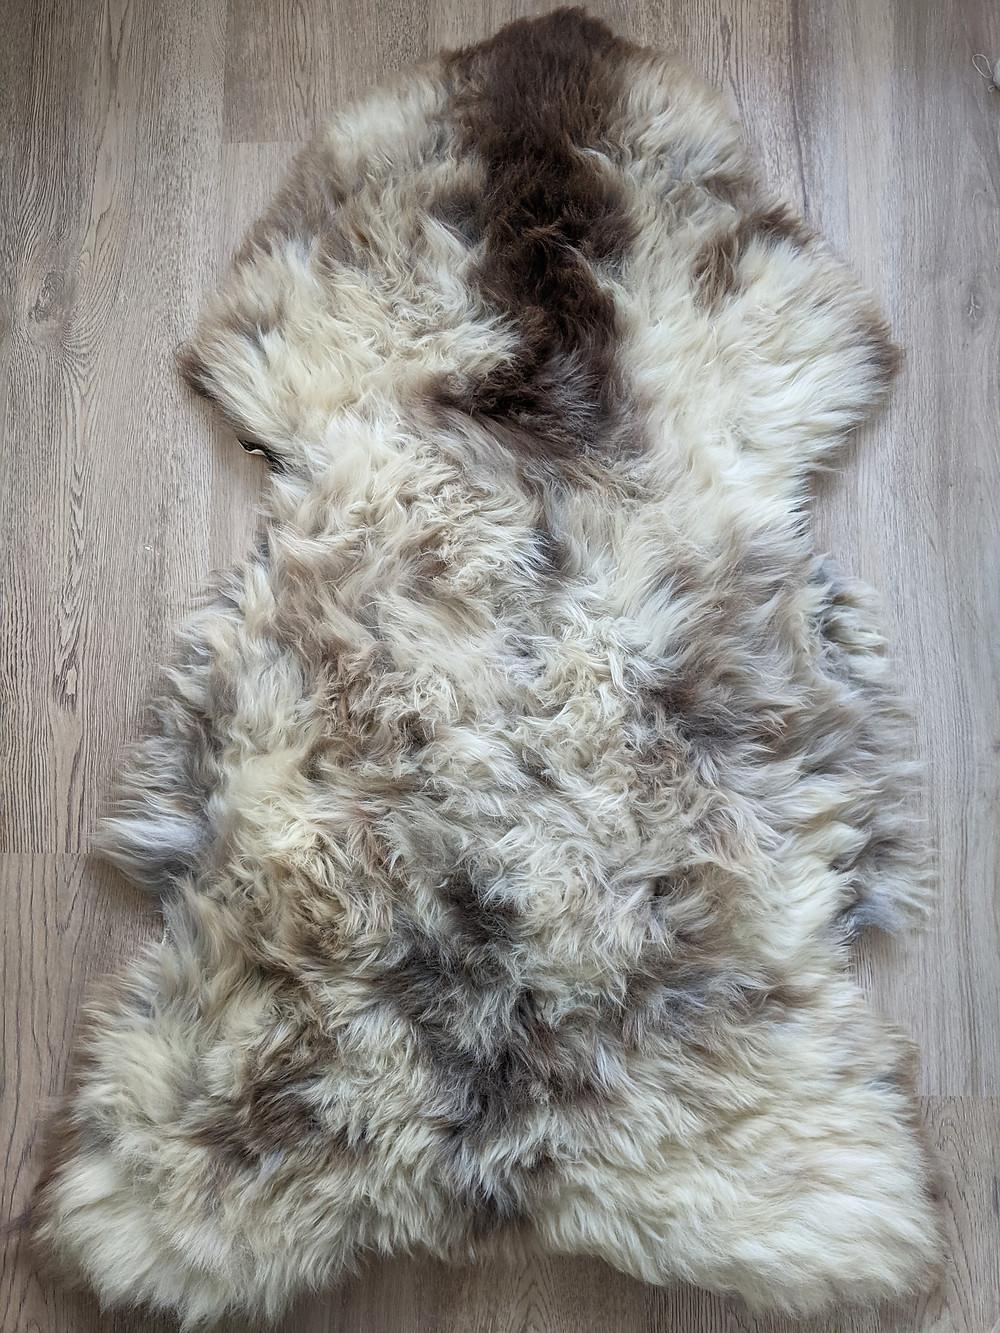 Sheepskin rug for sale